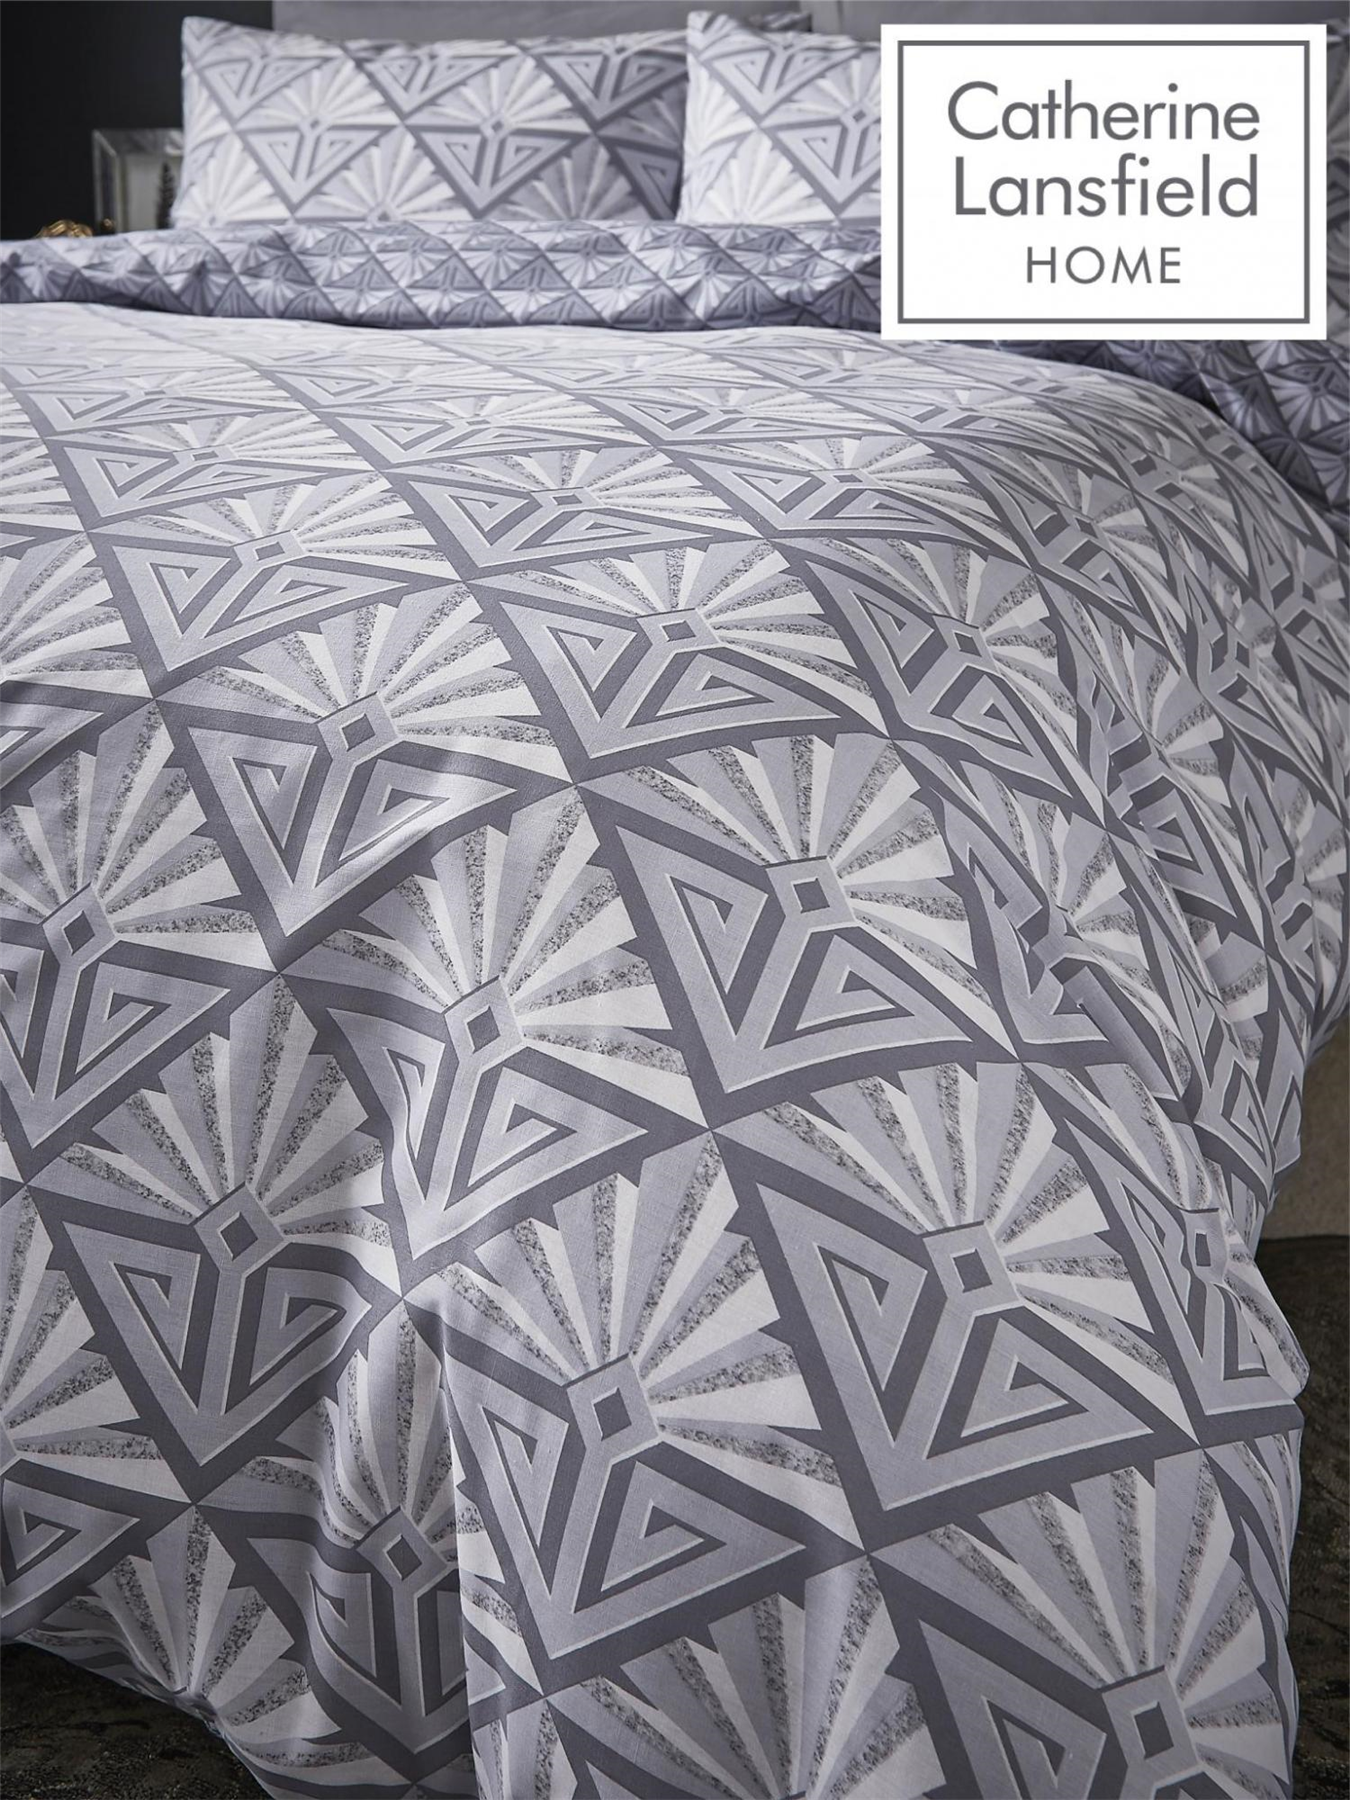 Catherine-Lansfield-Duvet-Set-Reversible-Art-Deco-Grey-Bedding-Pillows-Curtains thumbnail 22